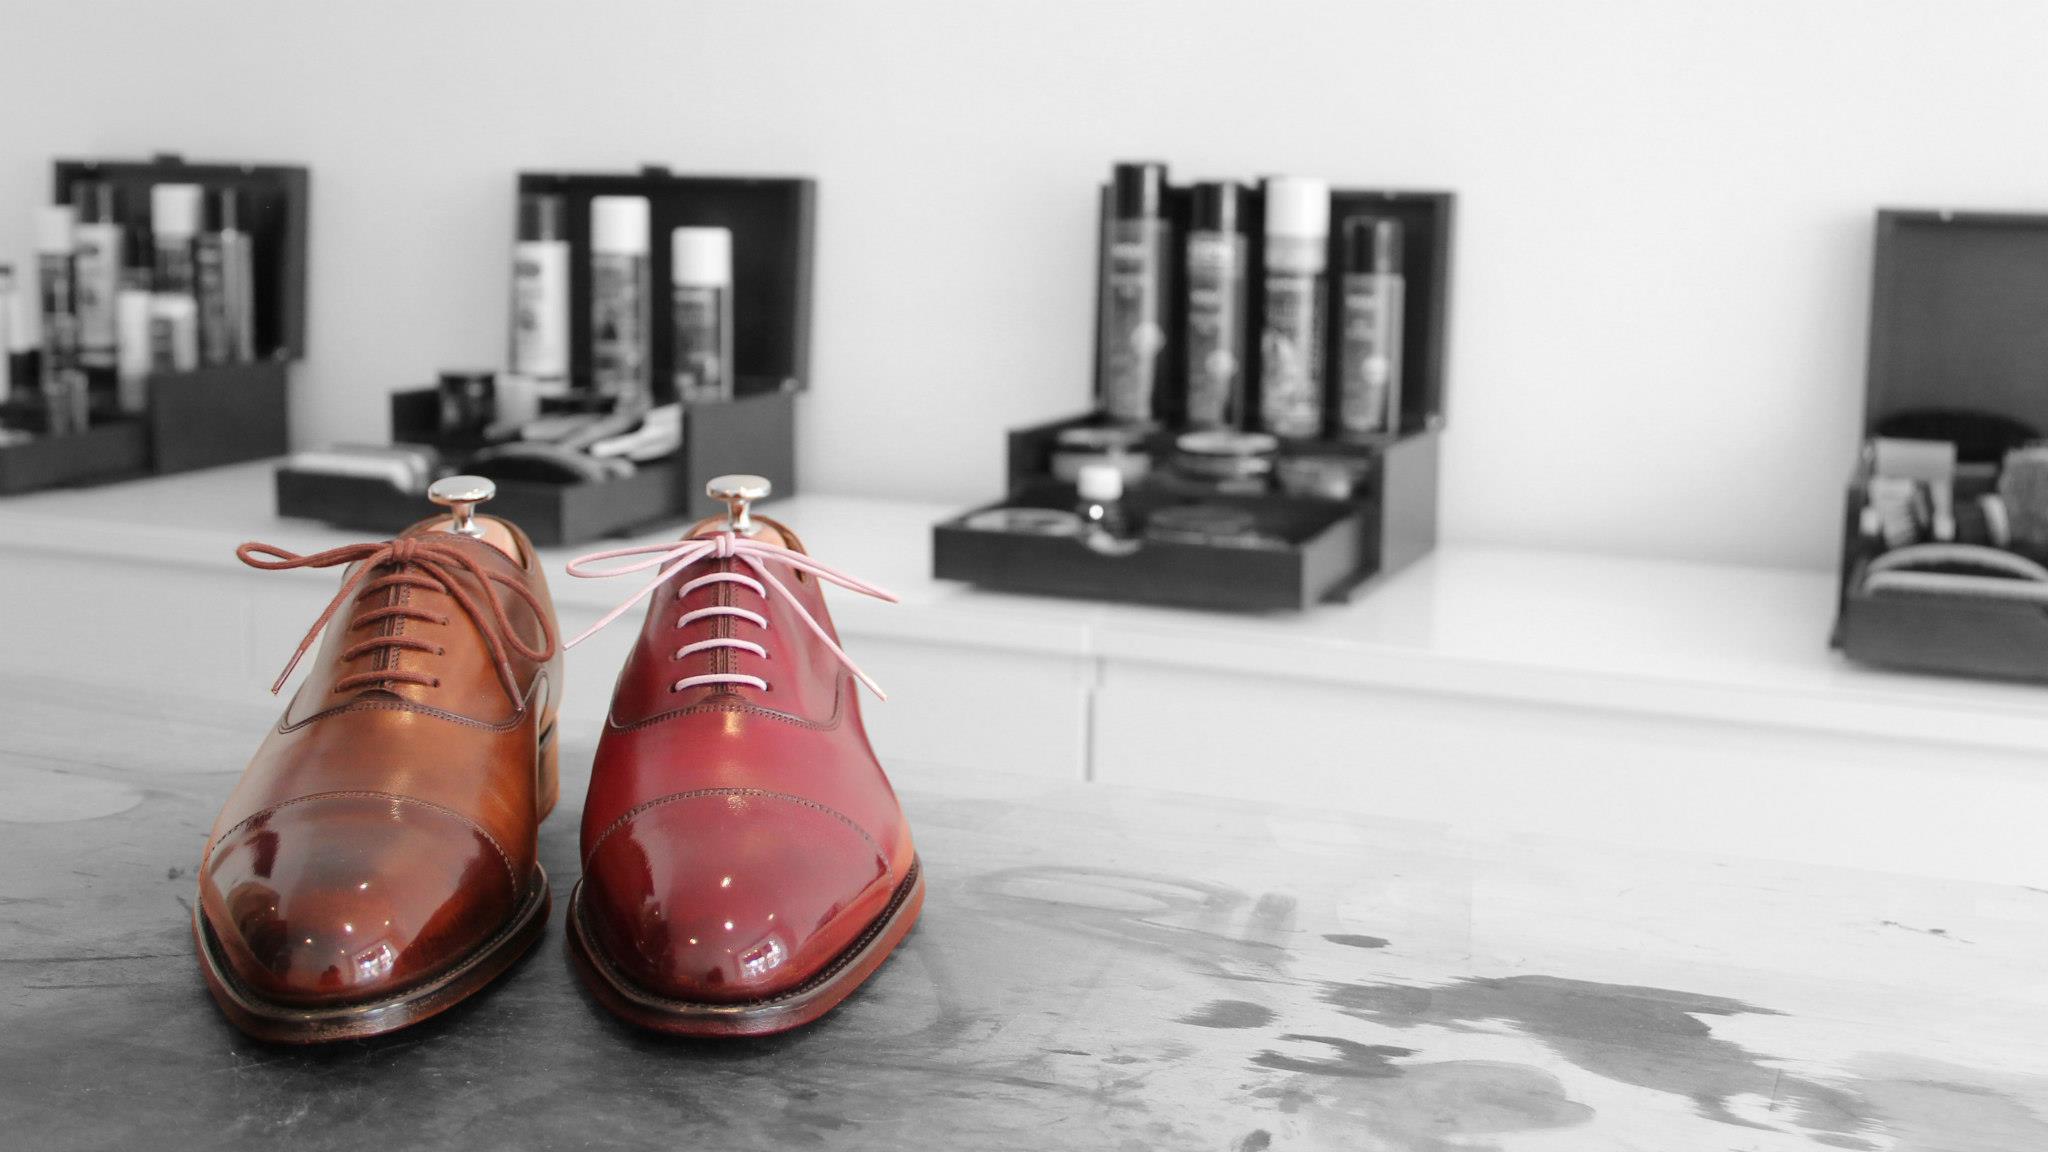 pack cirage monsieur chaussure. Black Bedroom Furniture Sets. Home Design Ideas